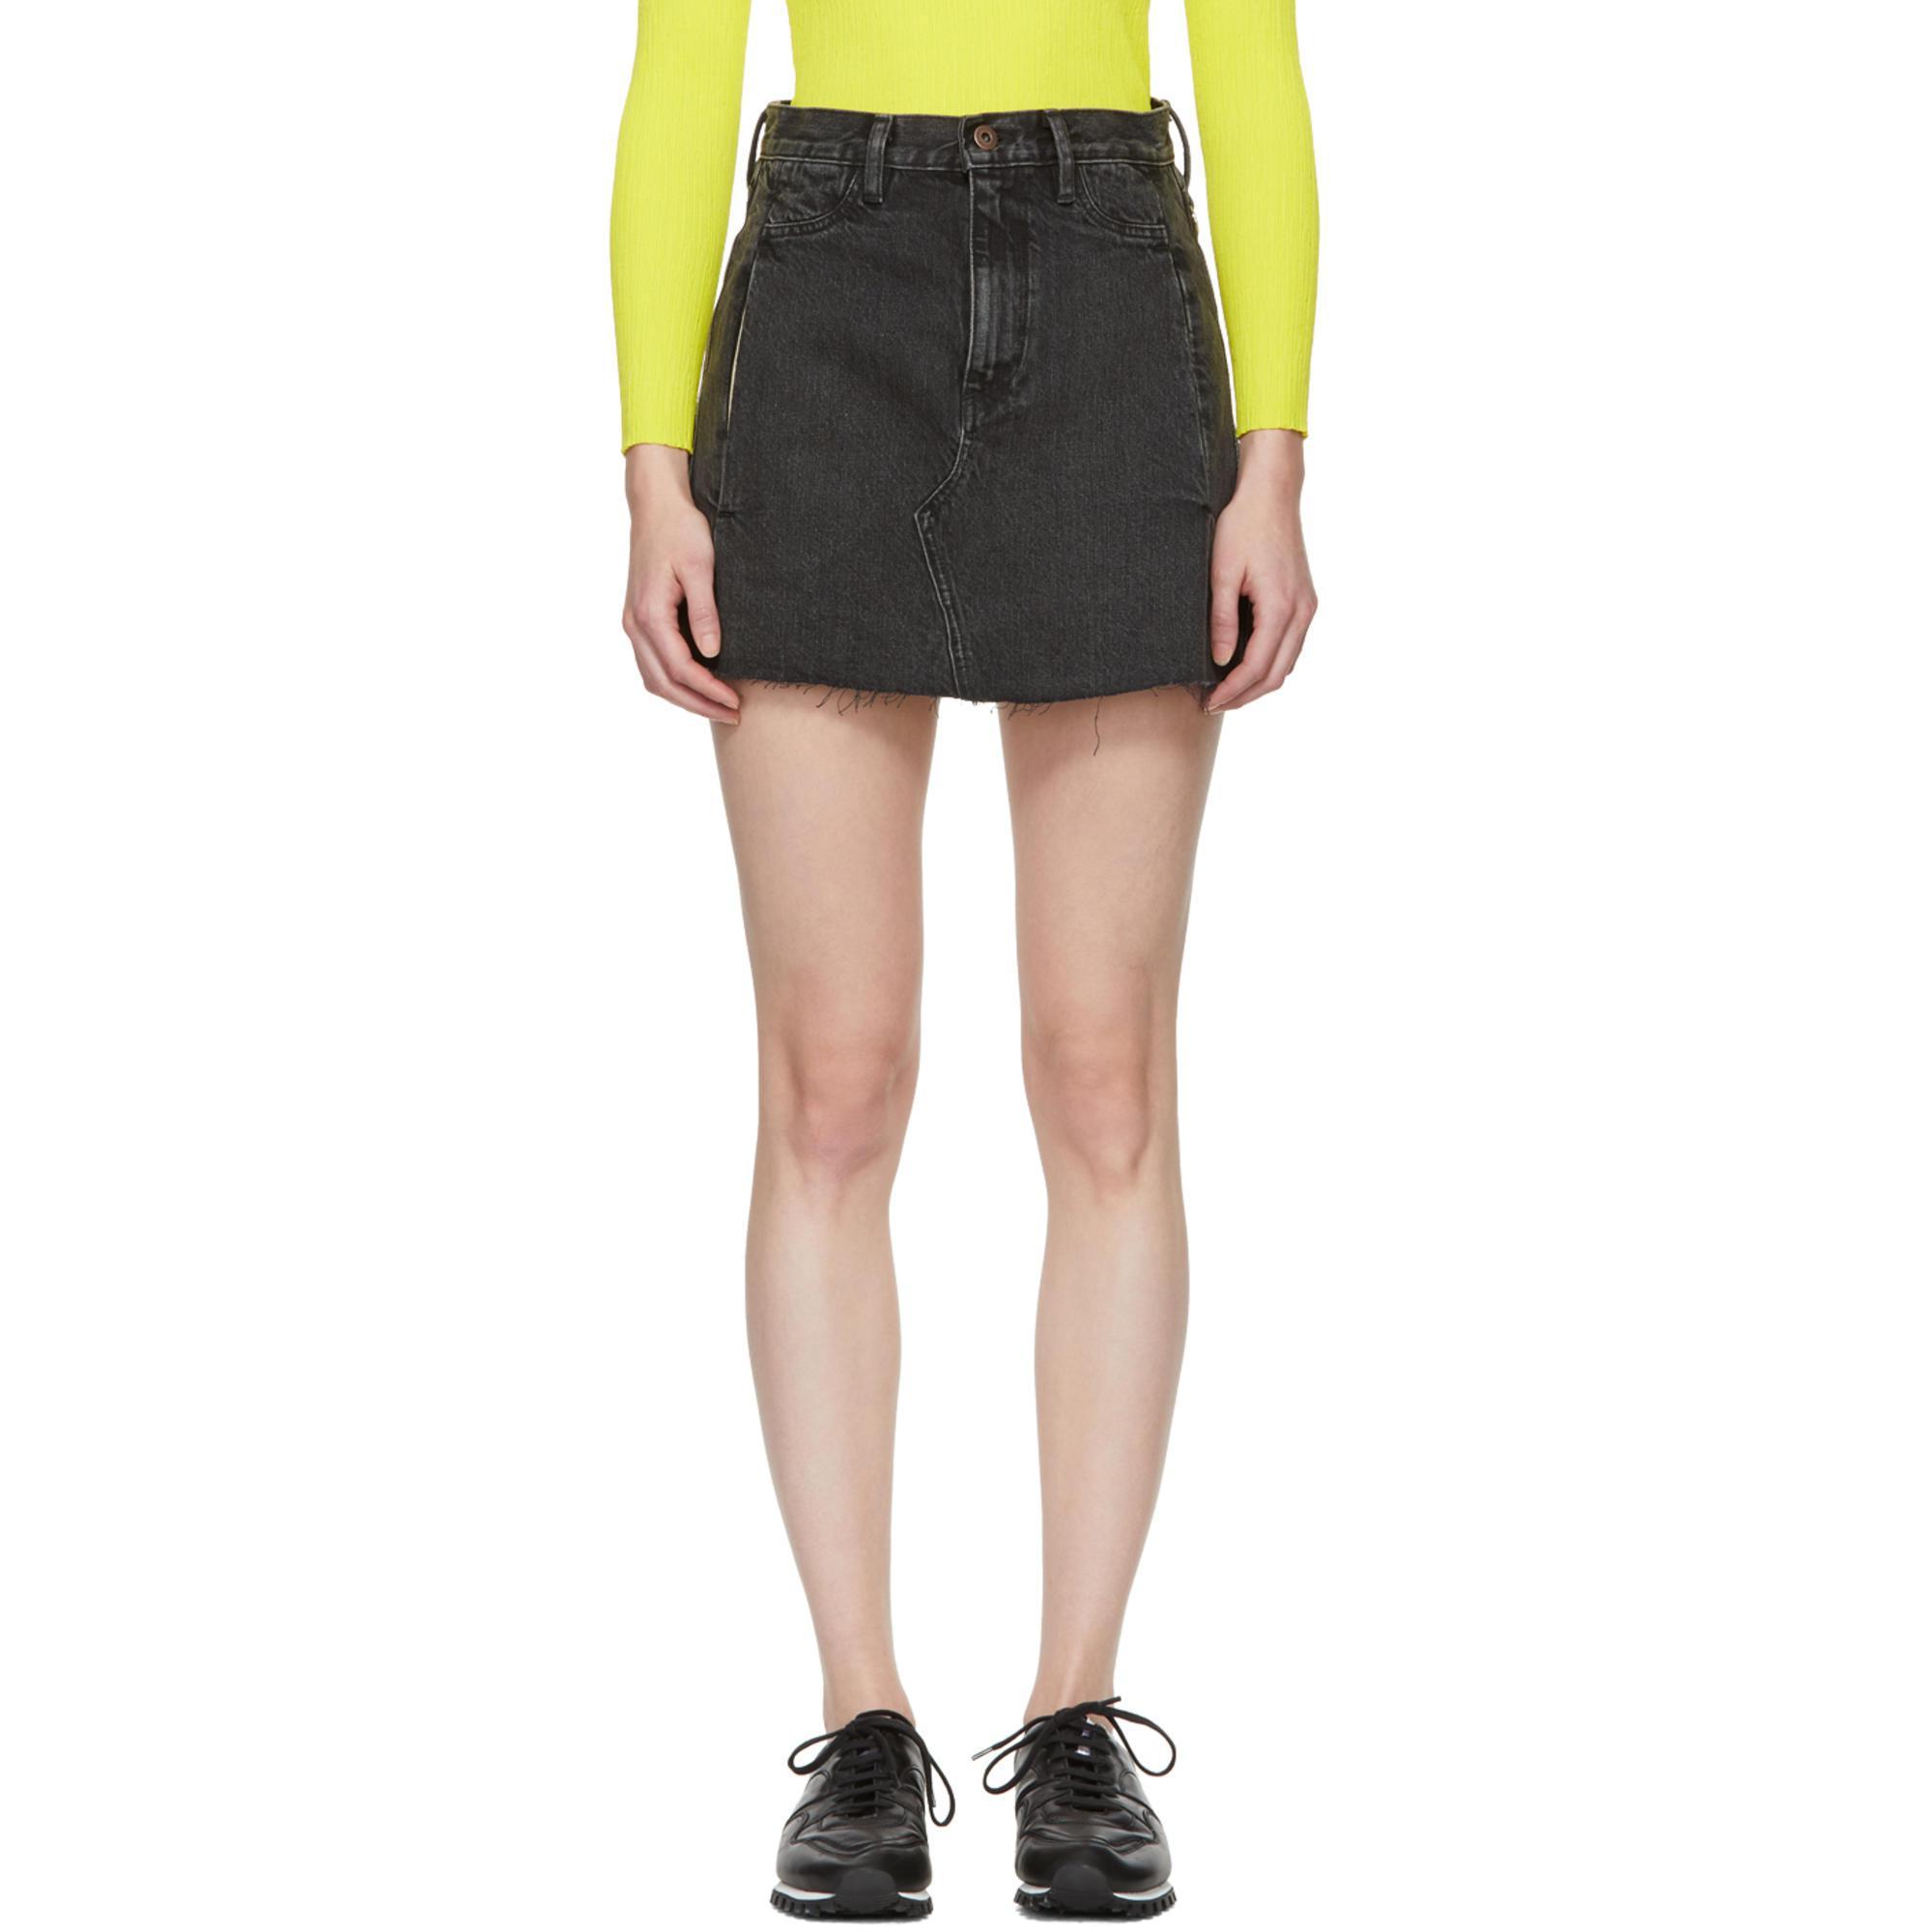 Black Nashua Denim Miniskirt Simon Miller Discount Really Discount Amazing Price Cheap Fashionable Cheapest Price gHzNfX